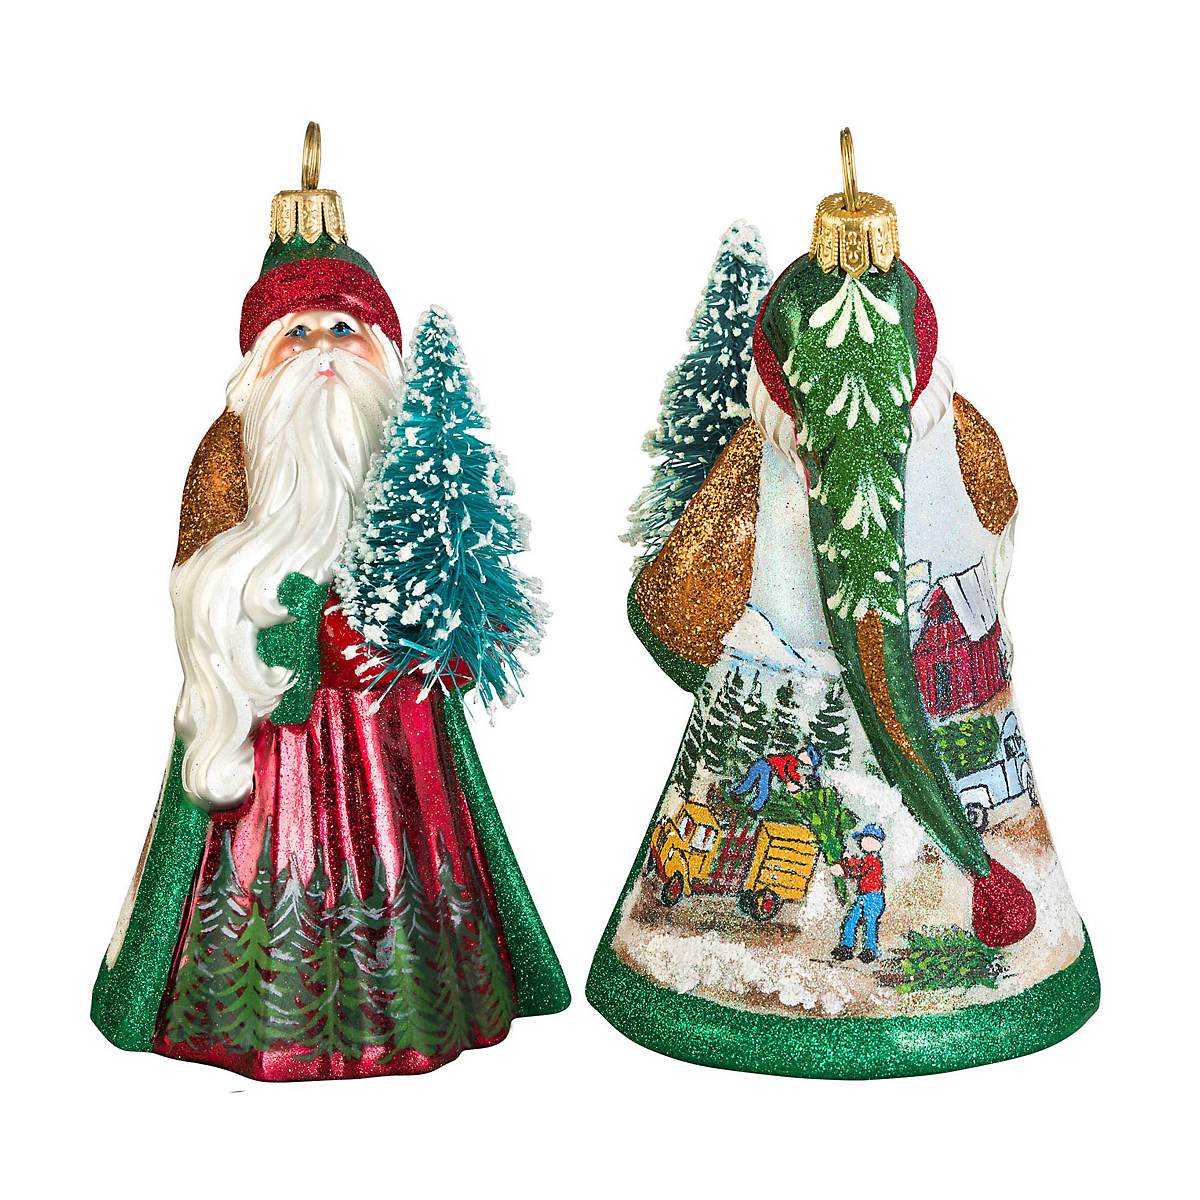 Christmas Tree Farms Victoria: Tree Farm Santa Christmas Ornament